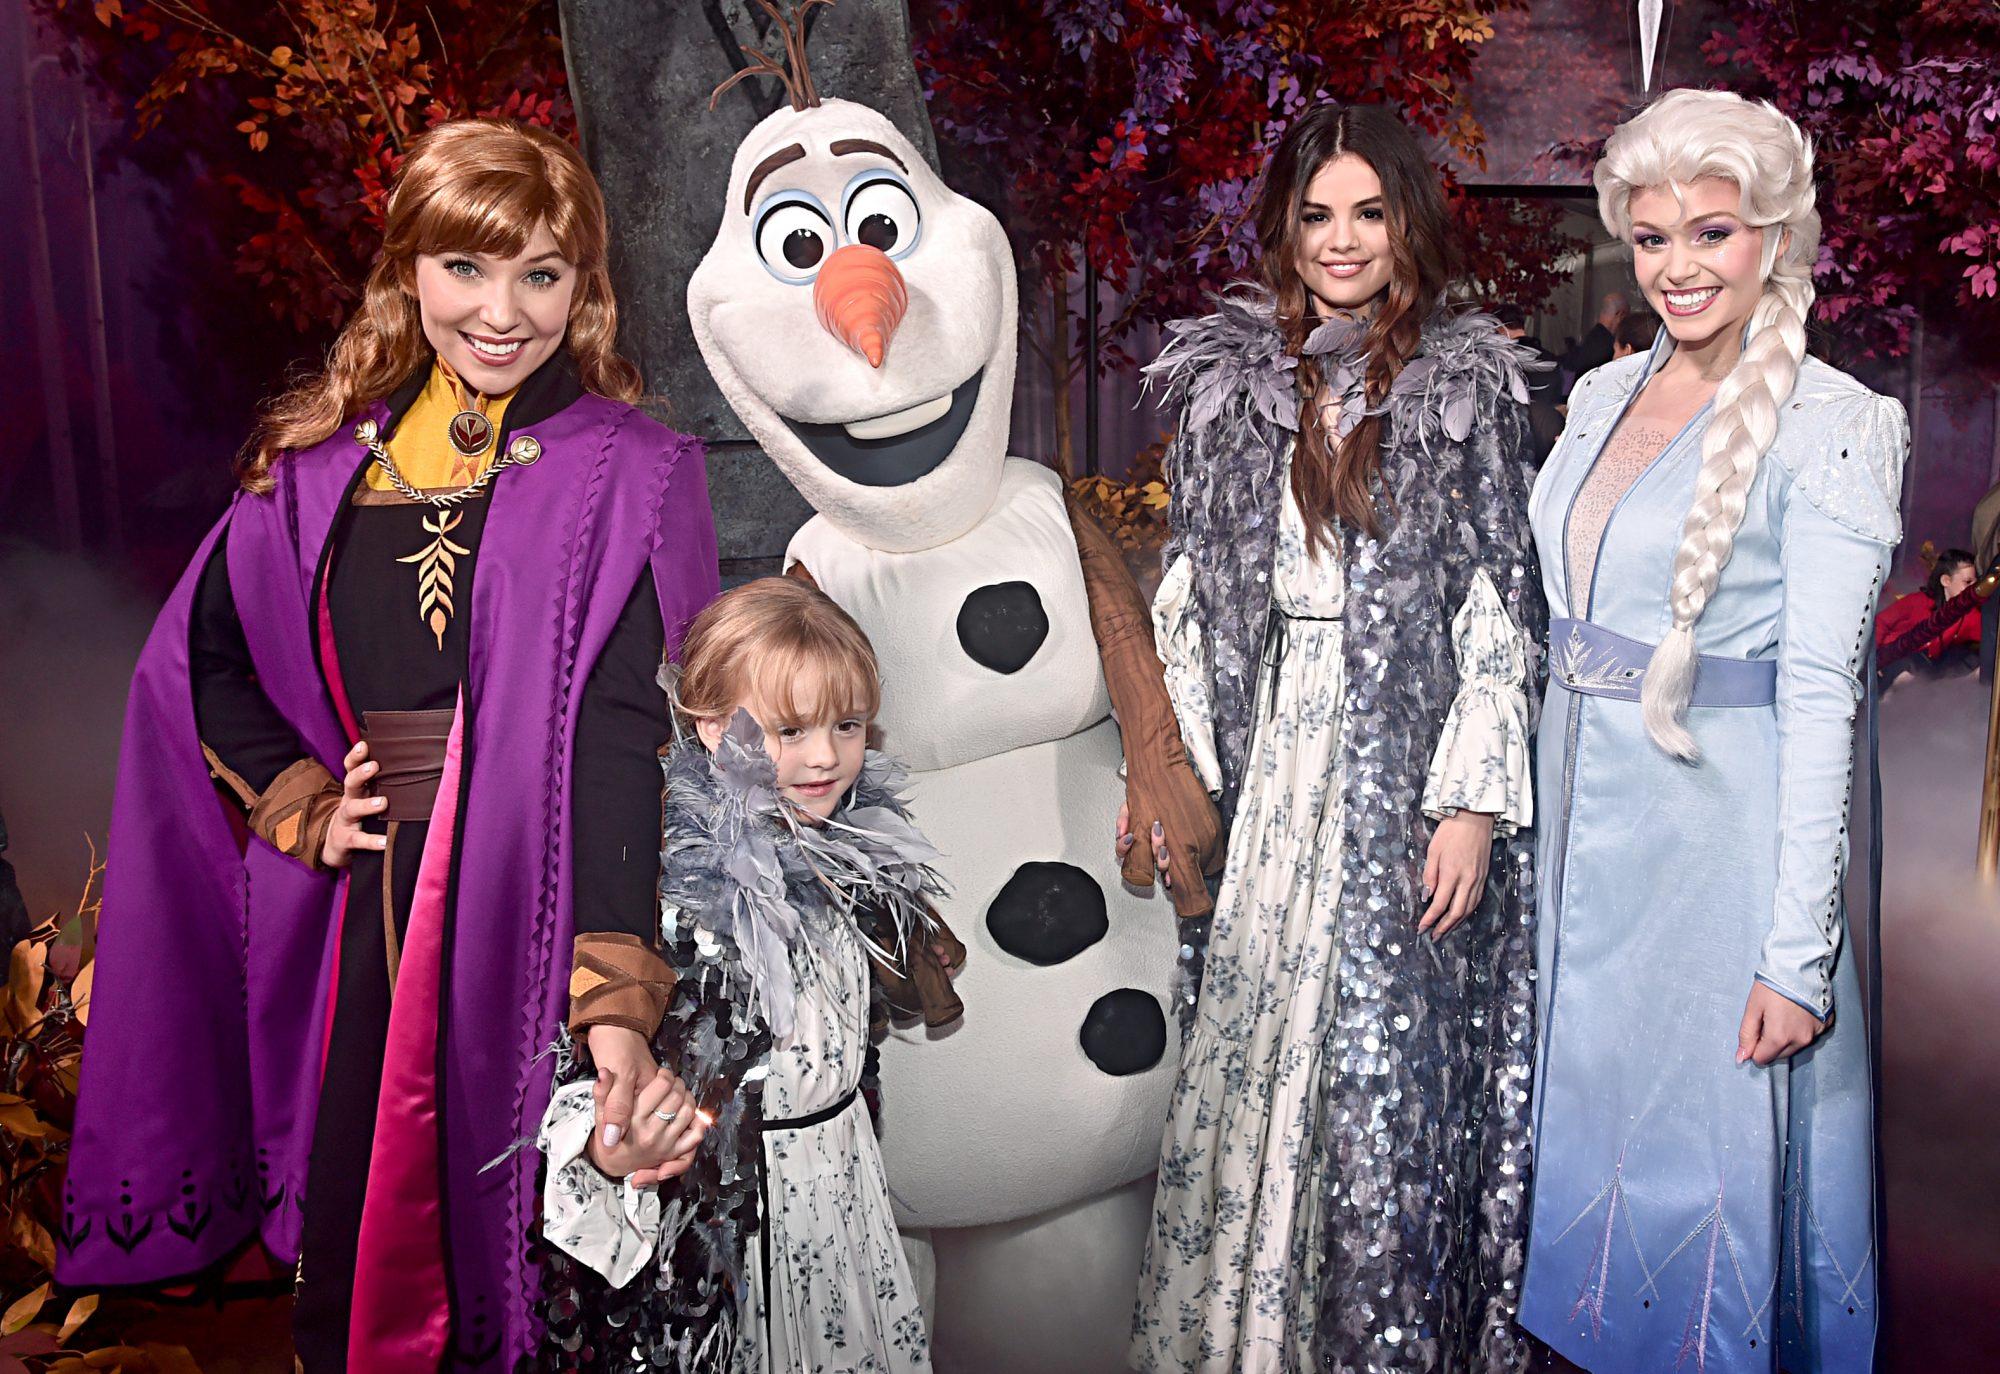 Frozen II, Gracie Teefey, Selena Gómez